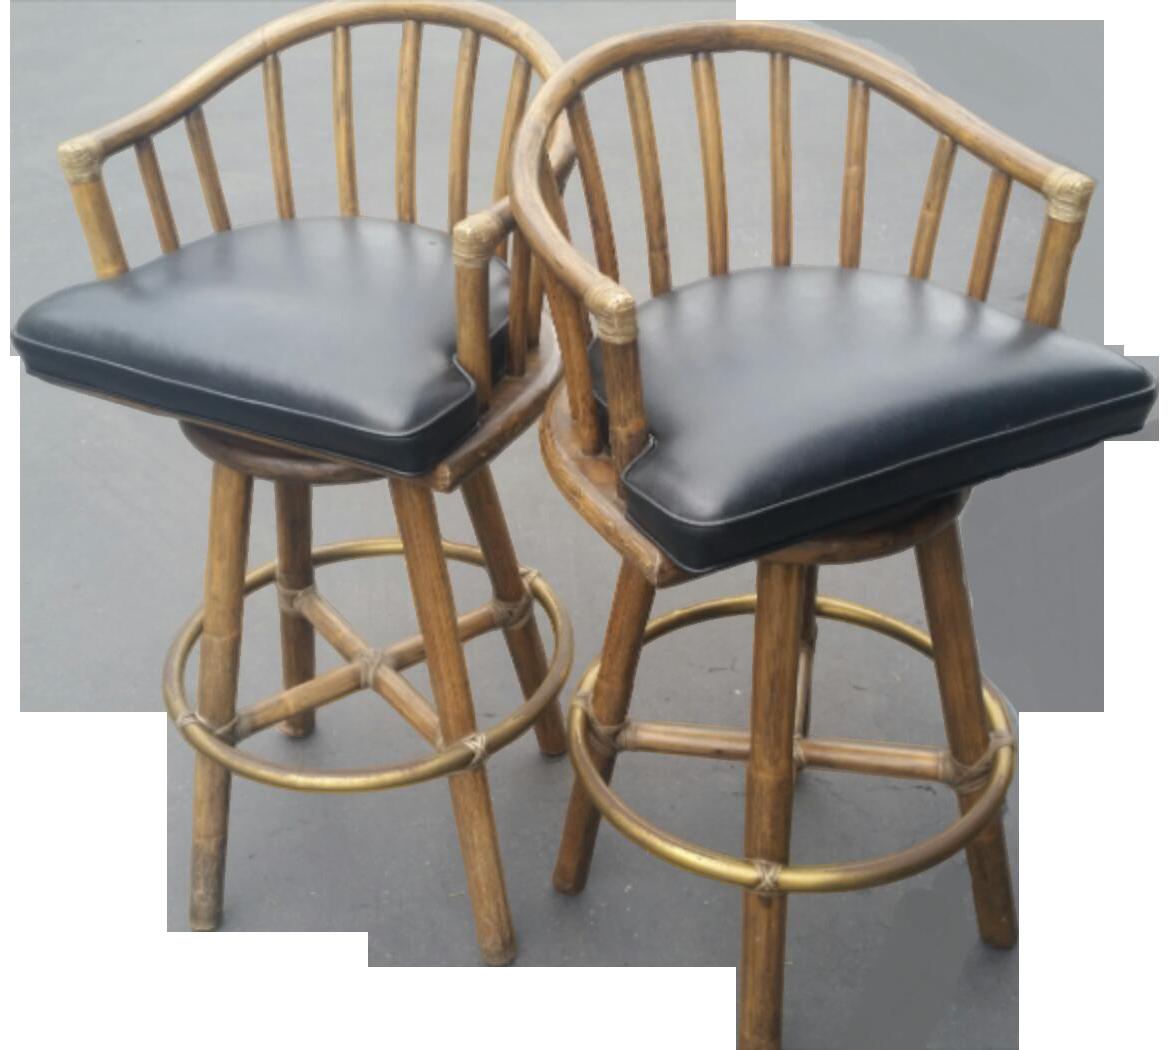 Mcguire rattan swivel barstool. Clipart chair bamboo chair